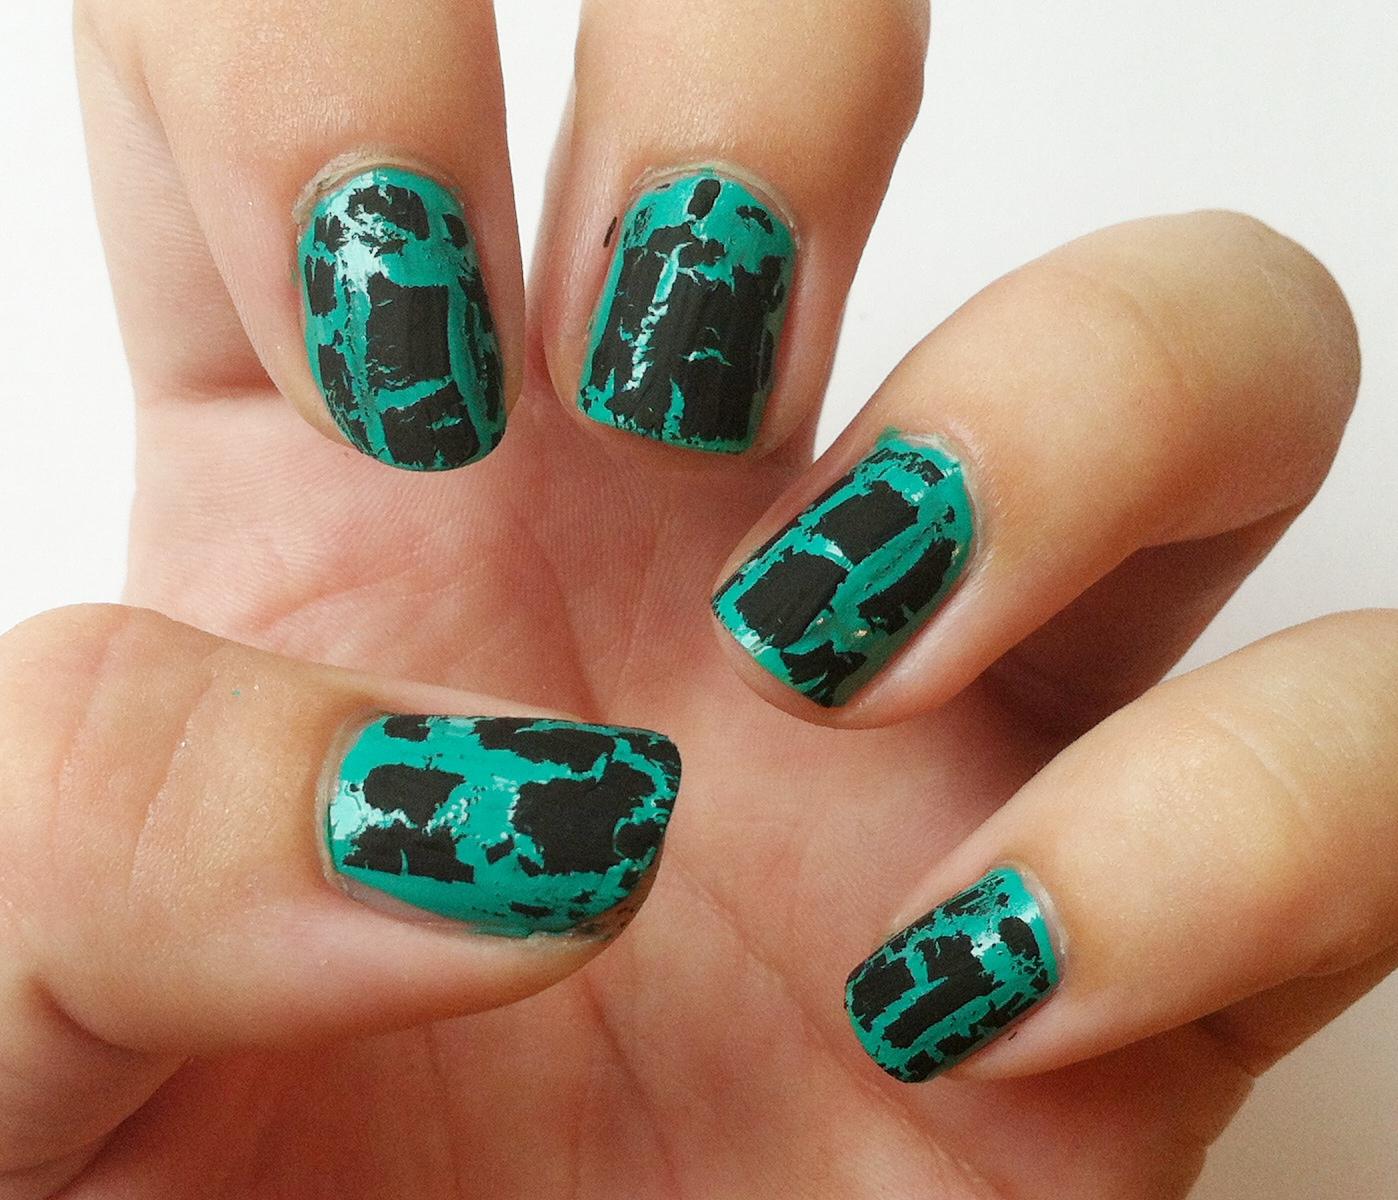 how to make nail polish crackle on plastic